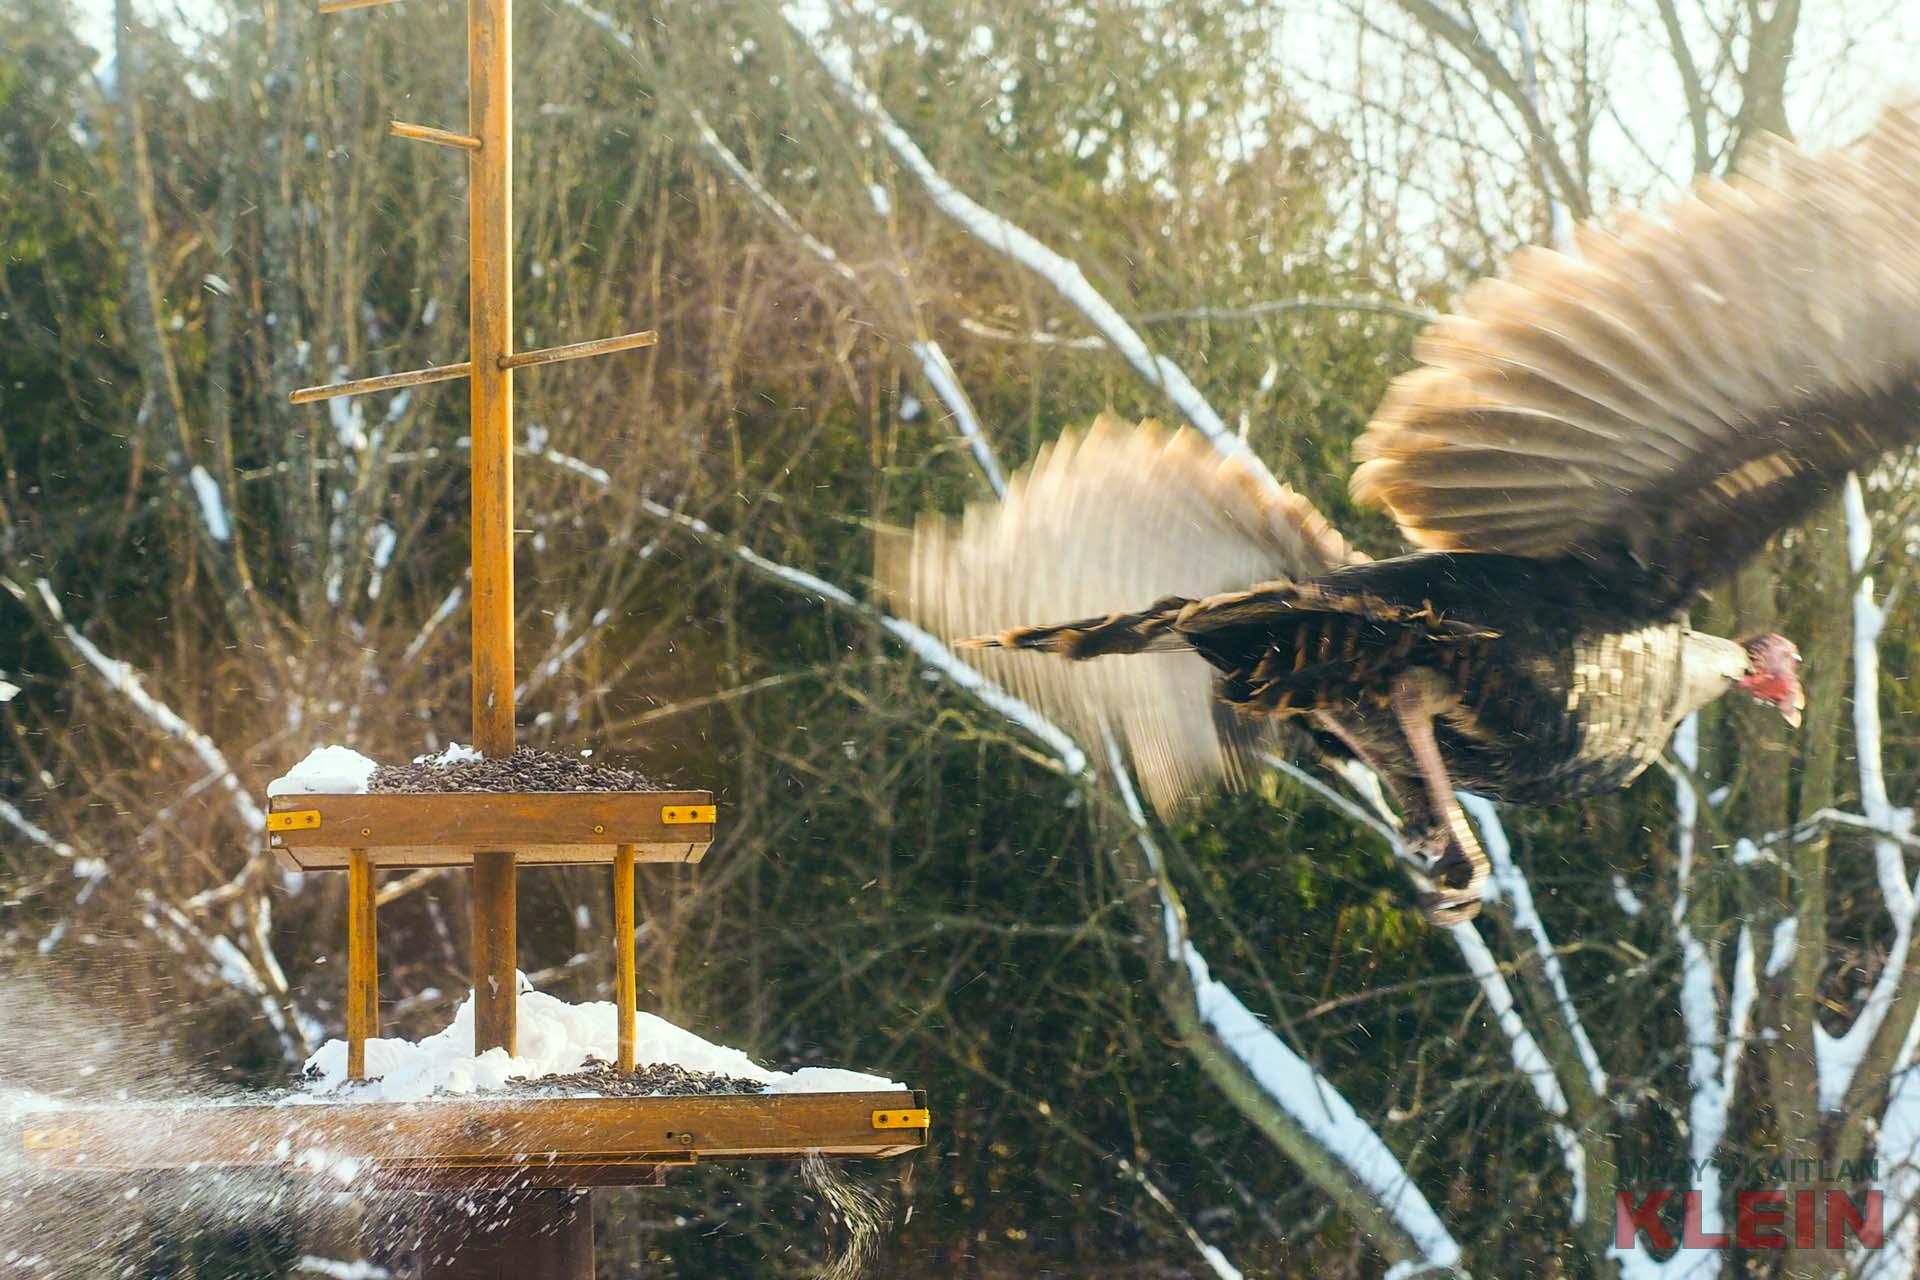 Wildlife, TUrkeys